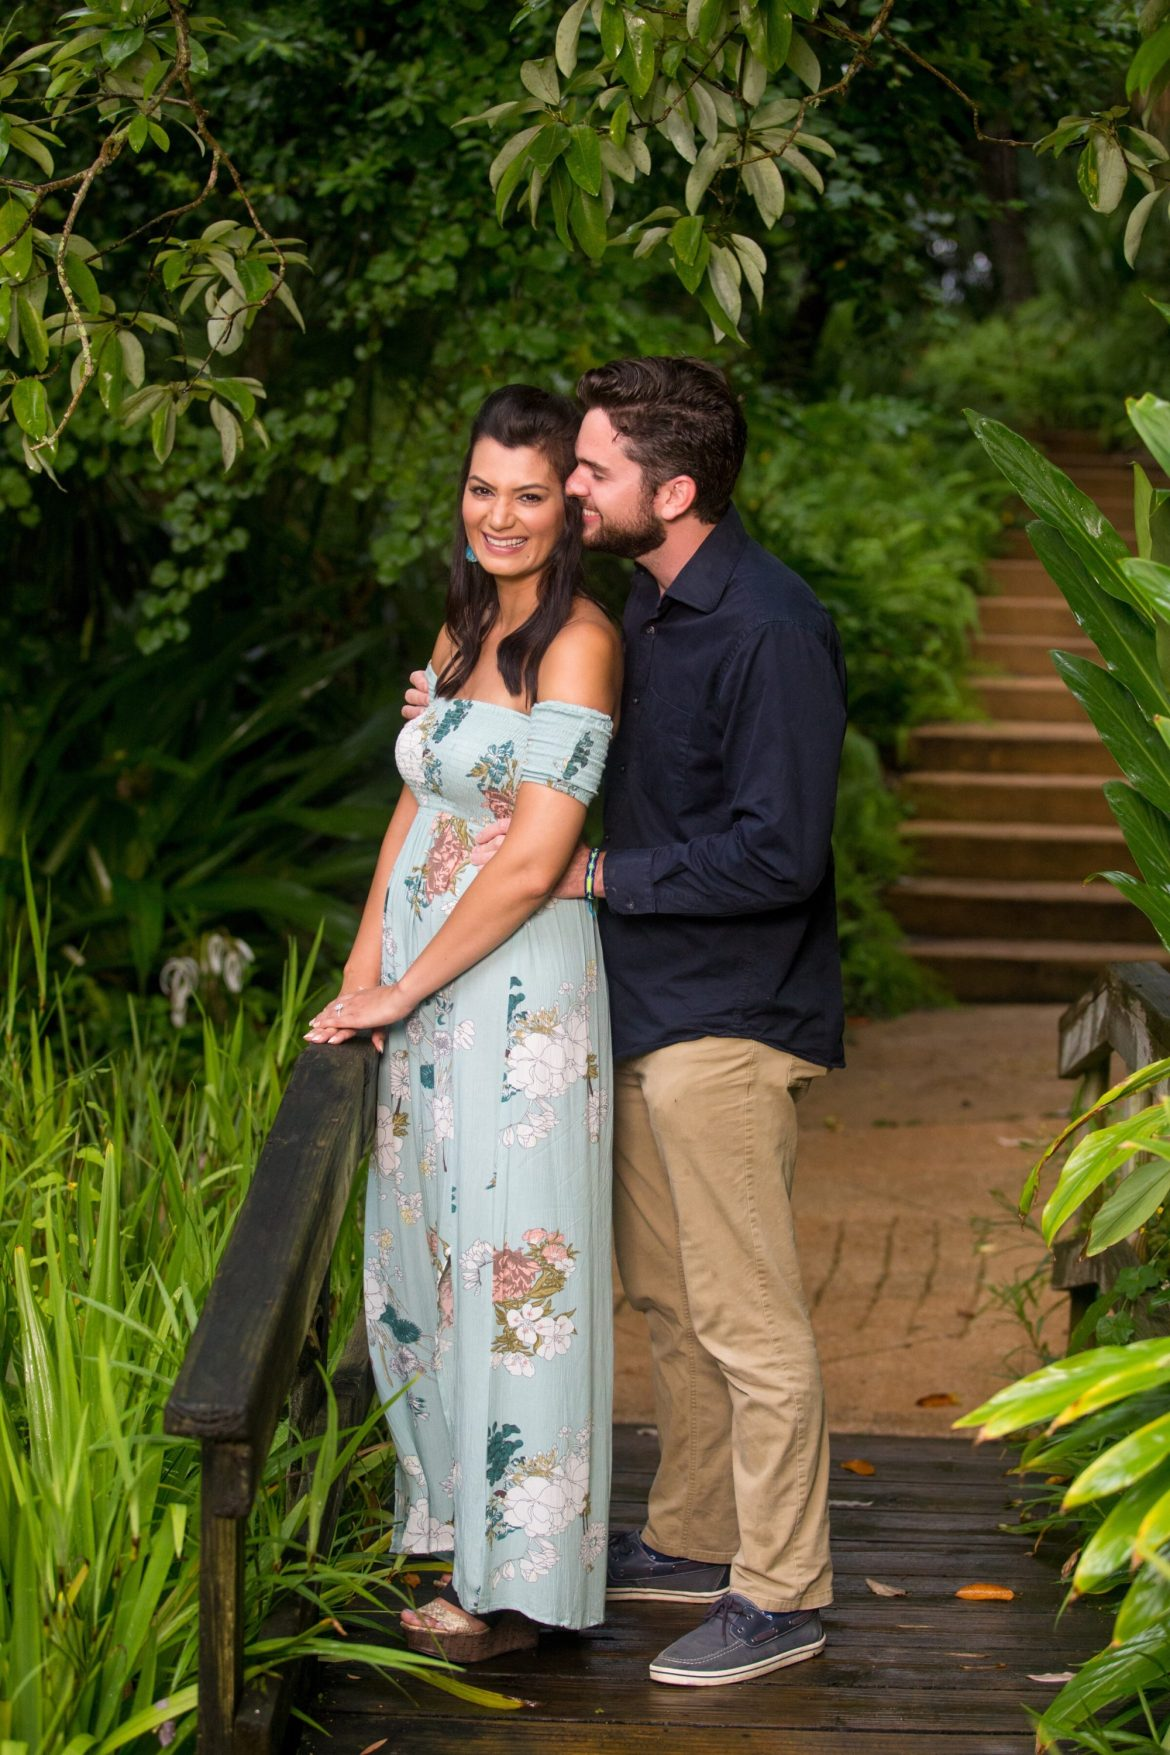 Ormond Beach wedding photographer captures proposal portrait